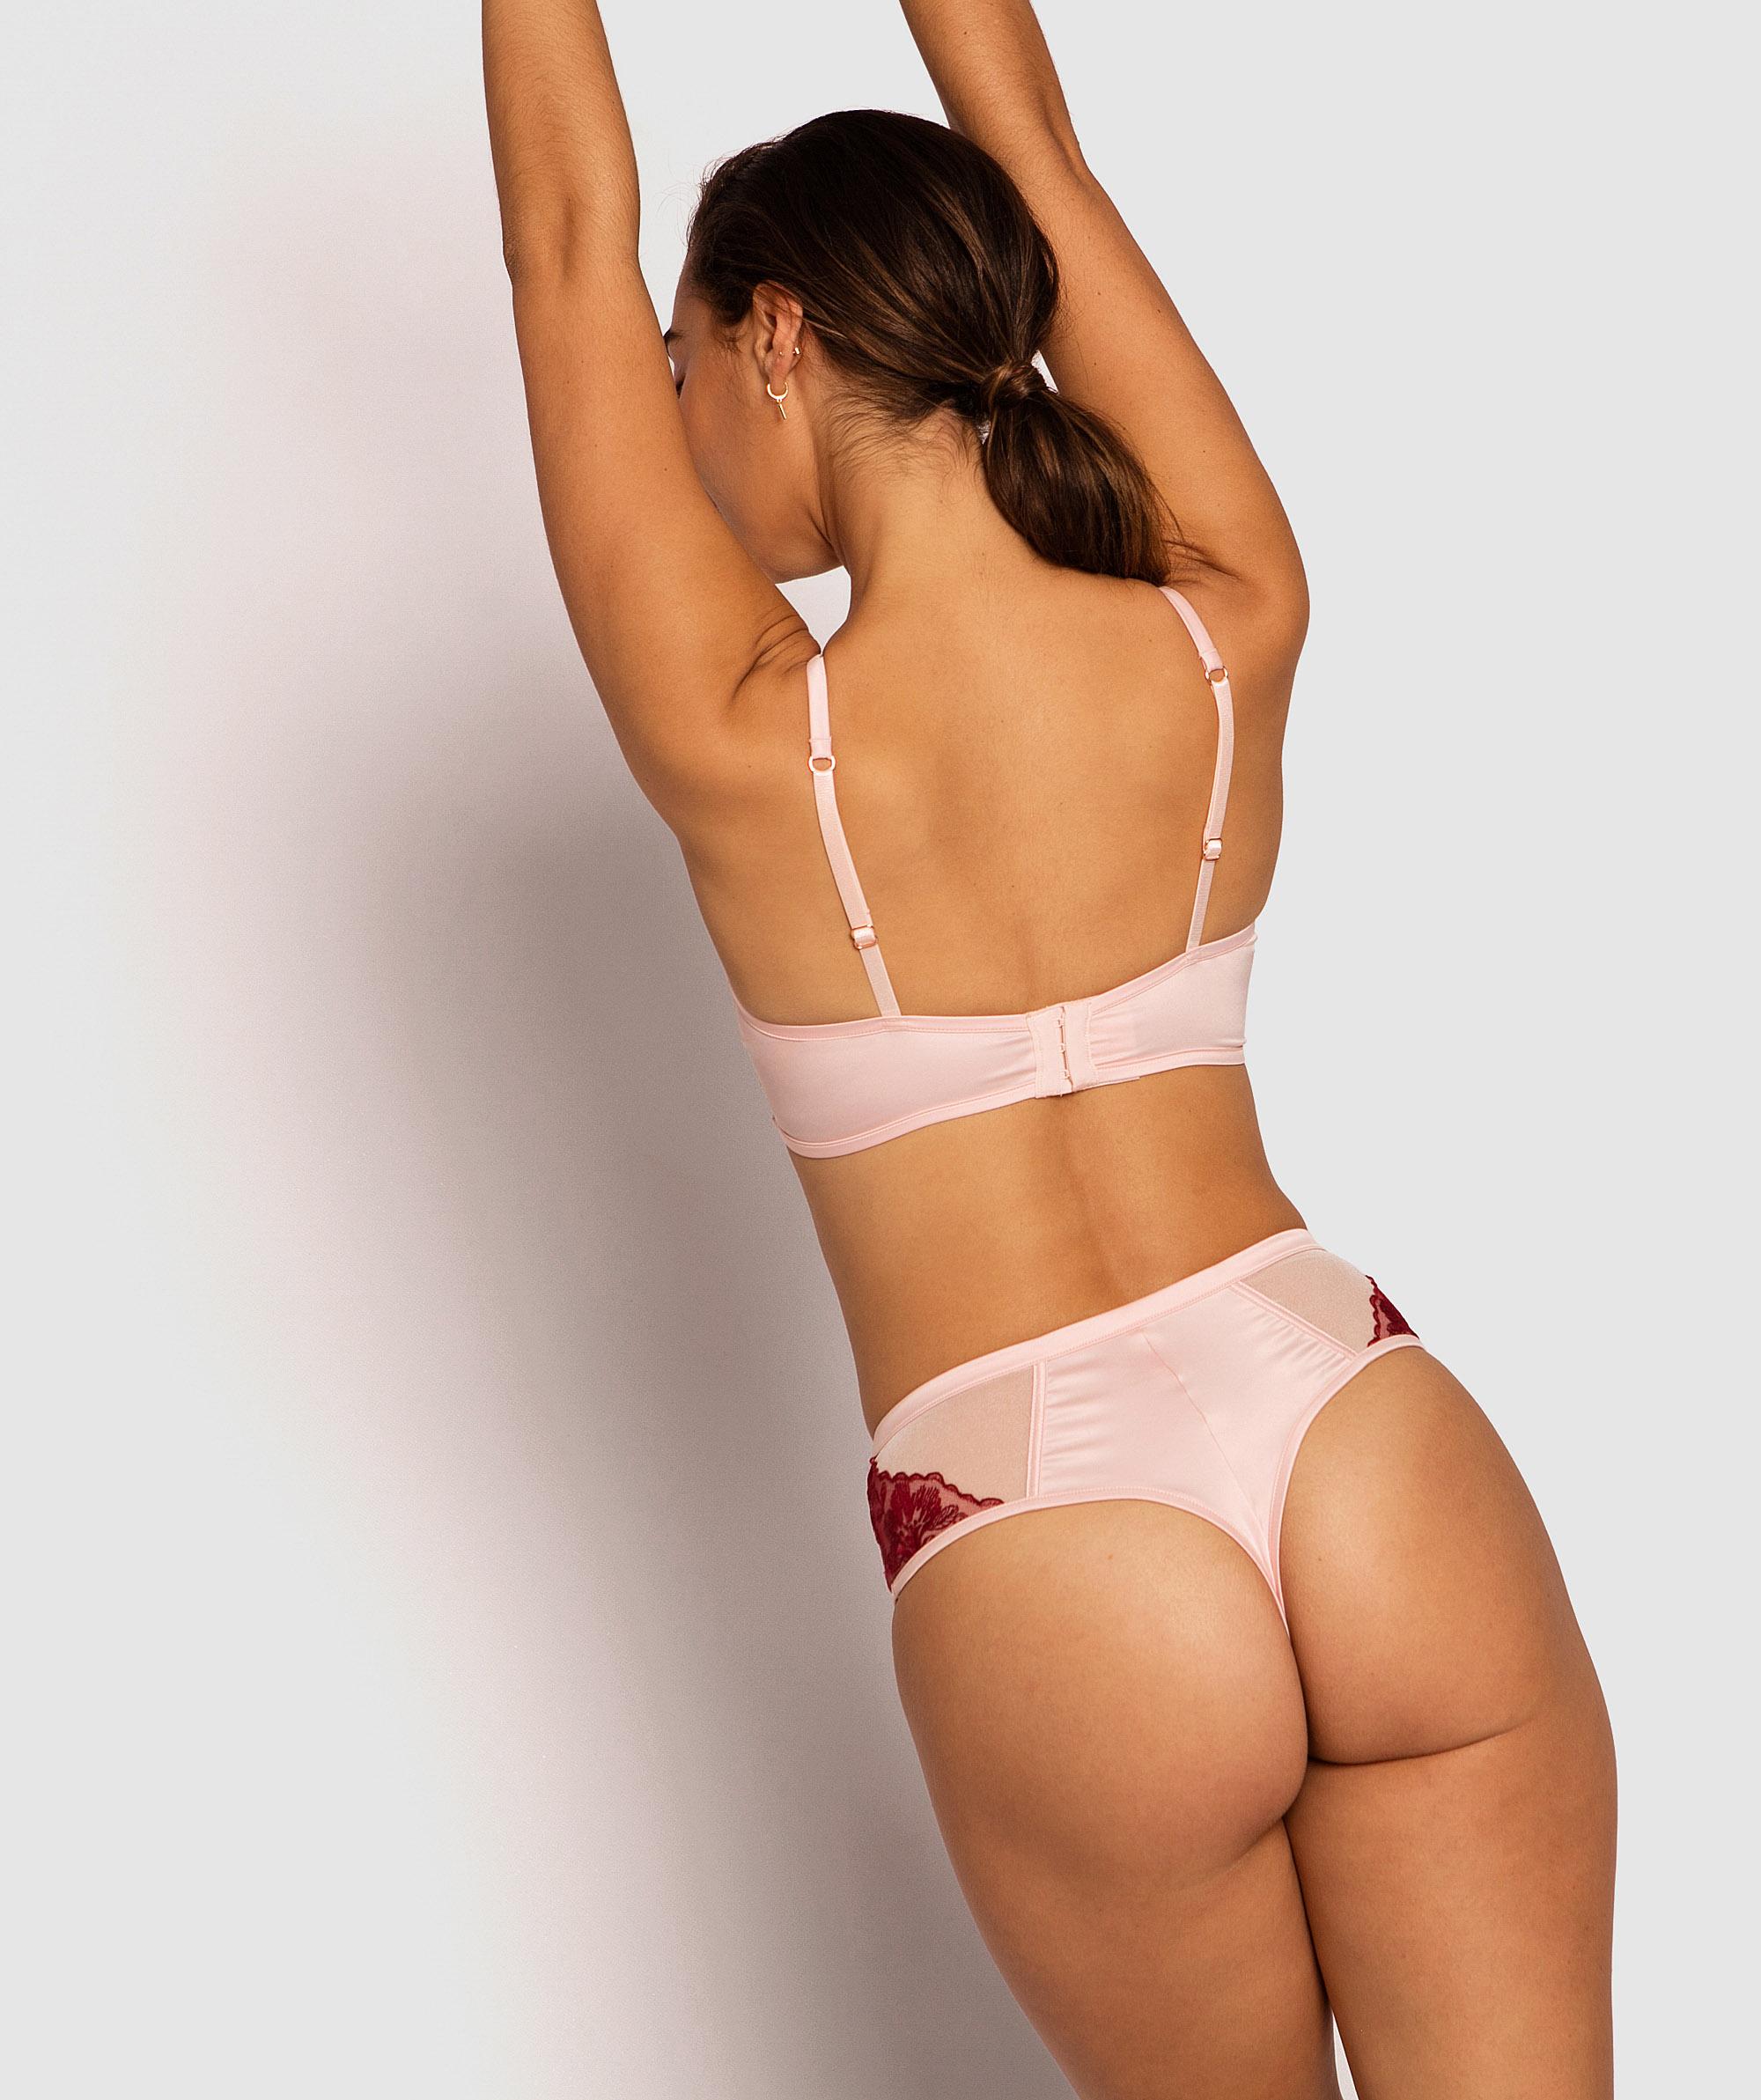 Enchanted Brescia High Waisted V String Knicker - Pale Pink/Dark Red